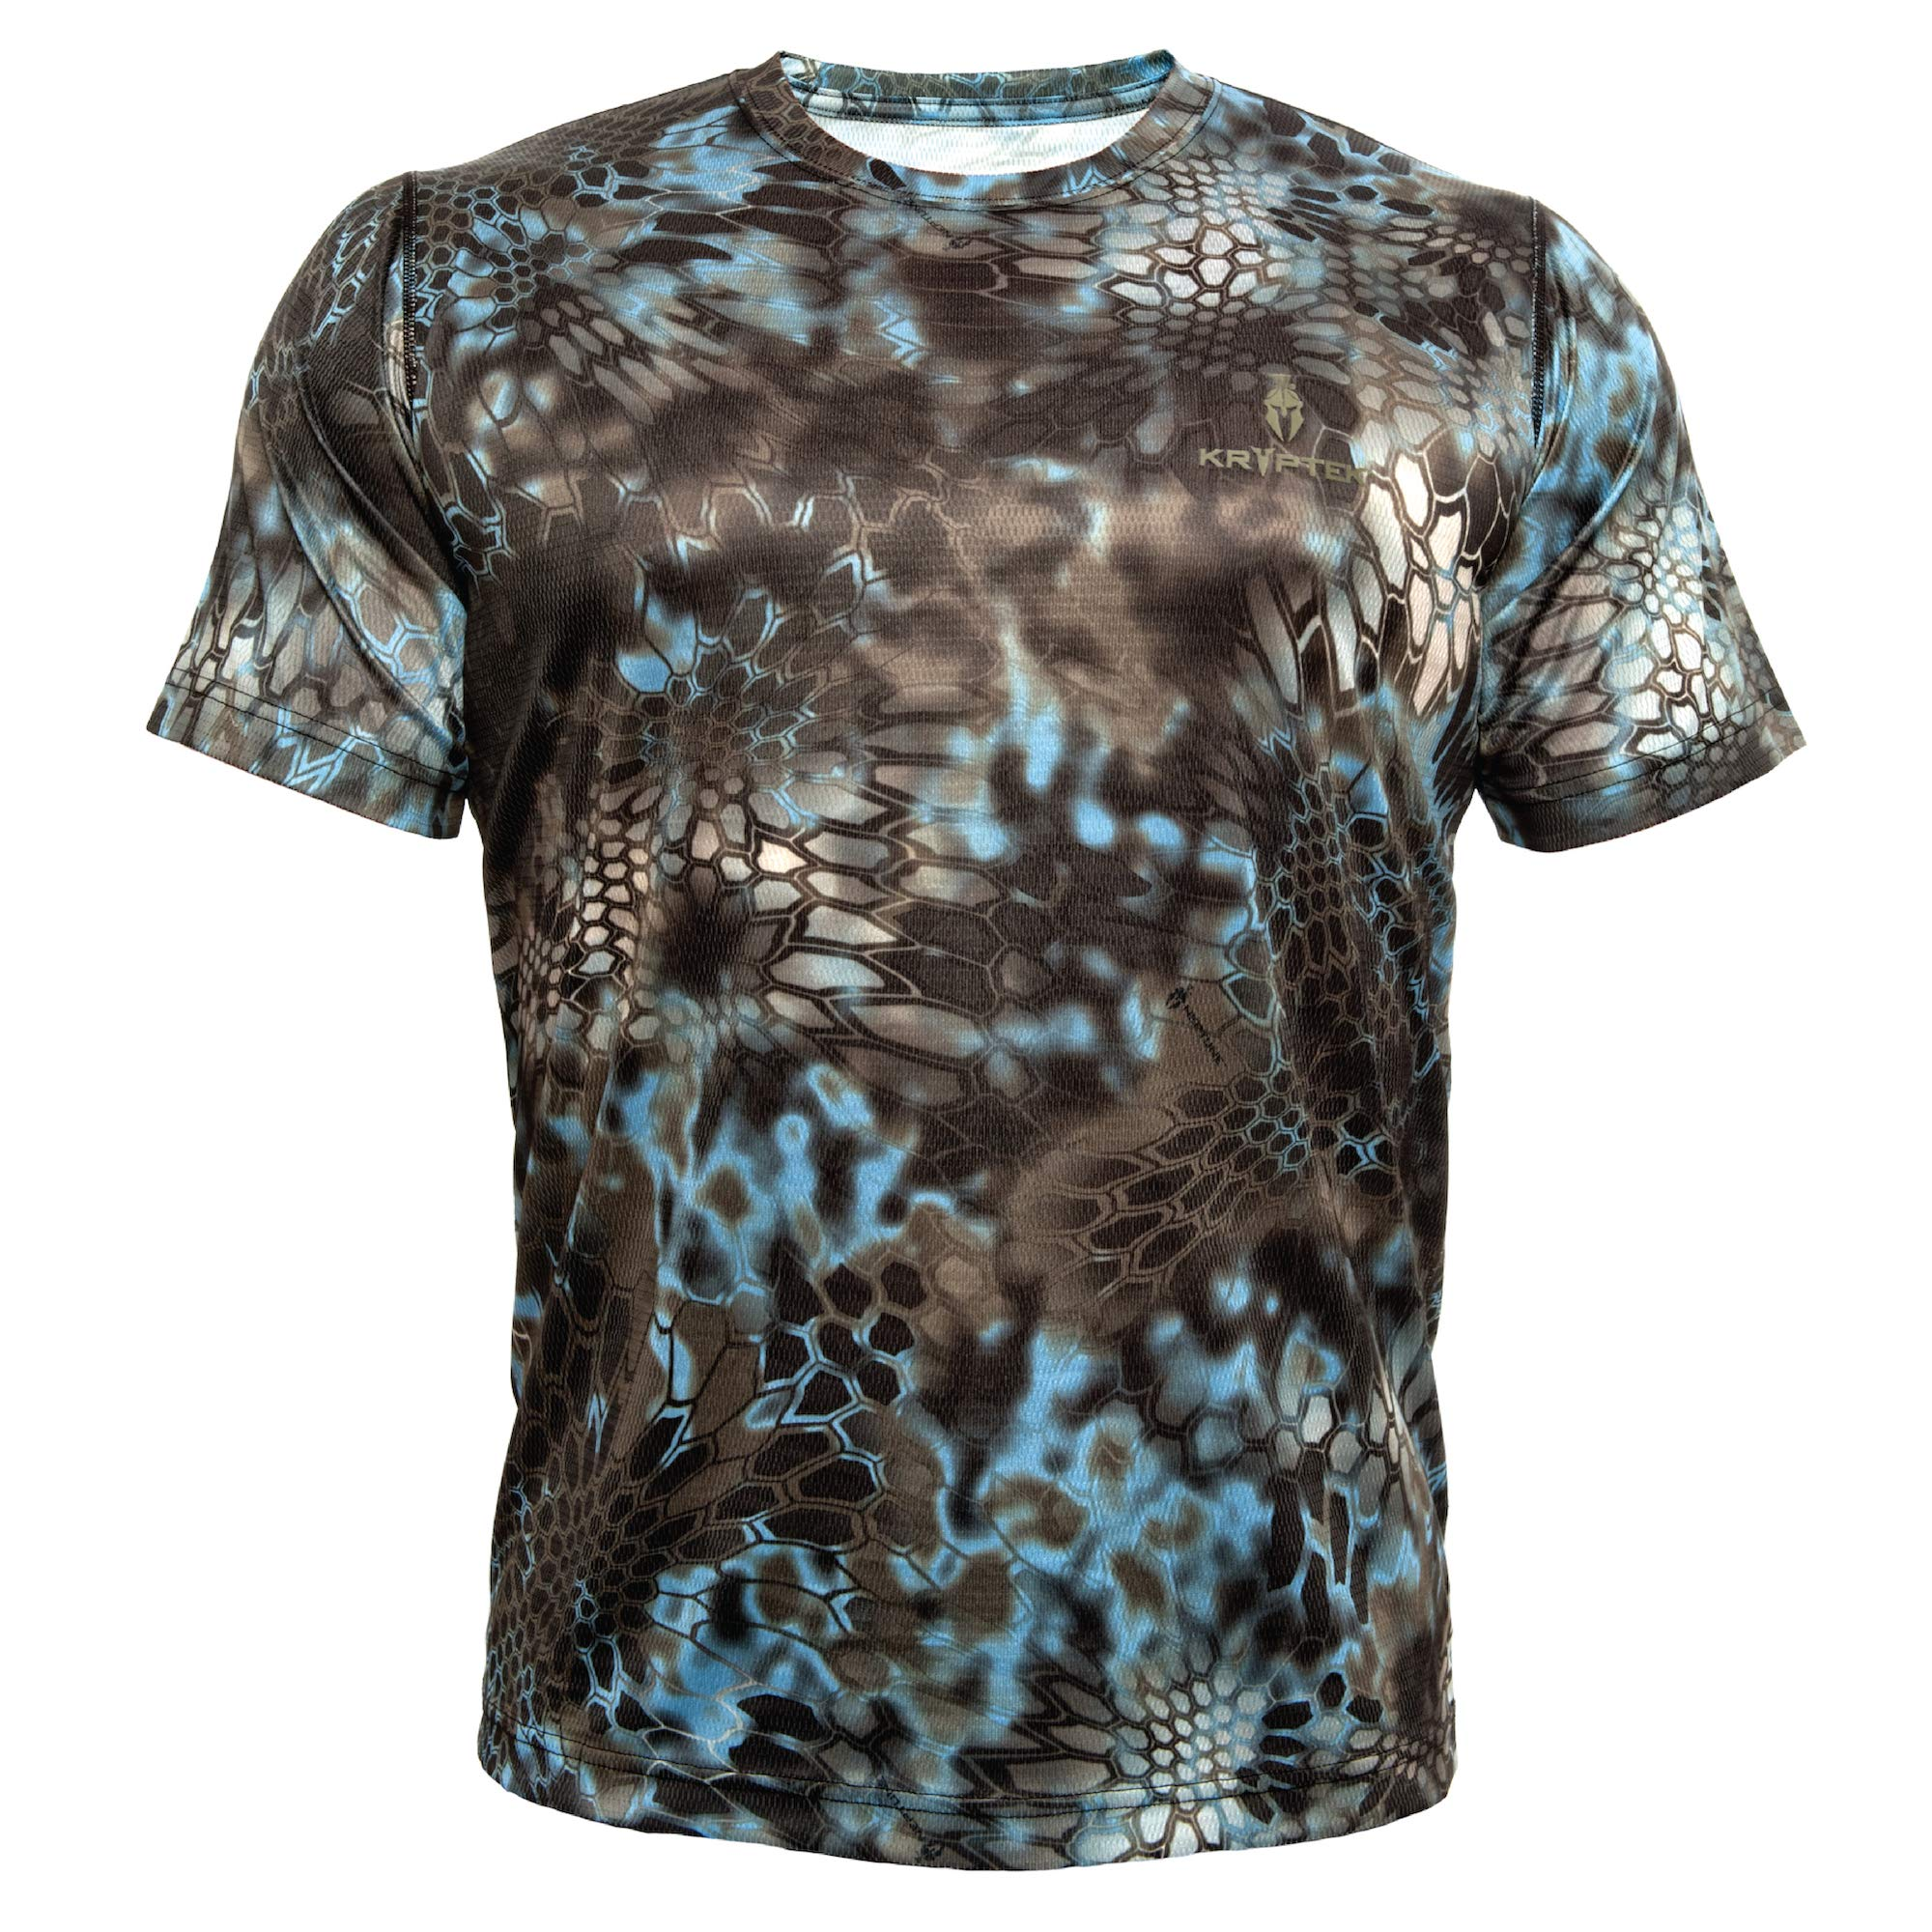 Kryptek Hyperion SS Crew - Short Sleeve Camo Hunting & Fishing Shirt (K-Ore Collection), Neptune, XS by Kryptek